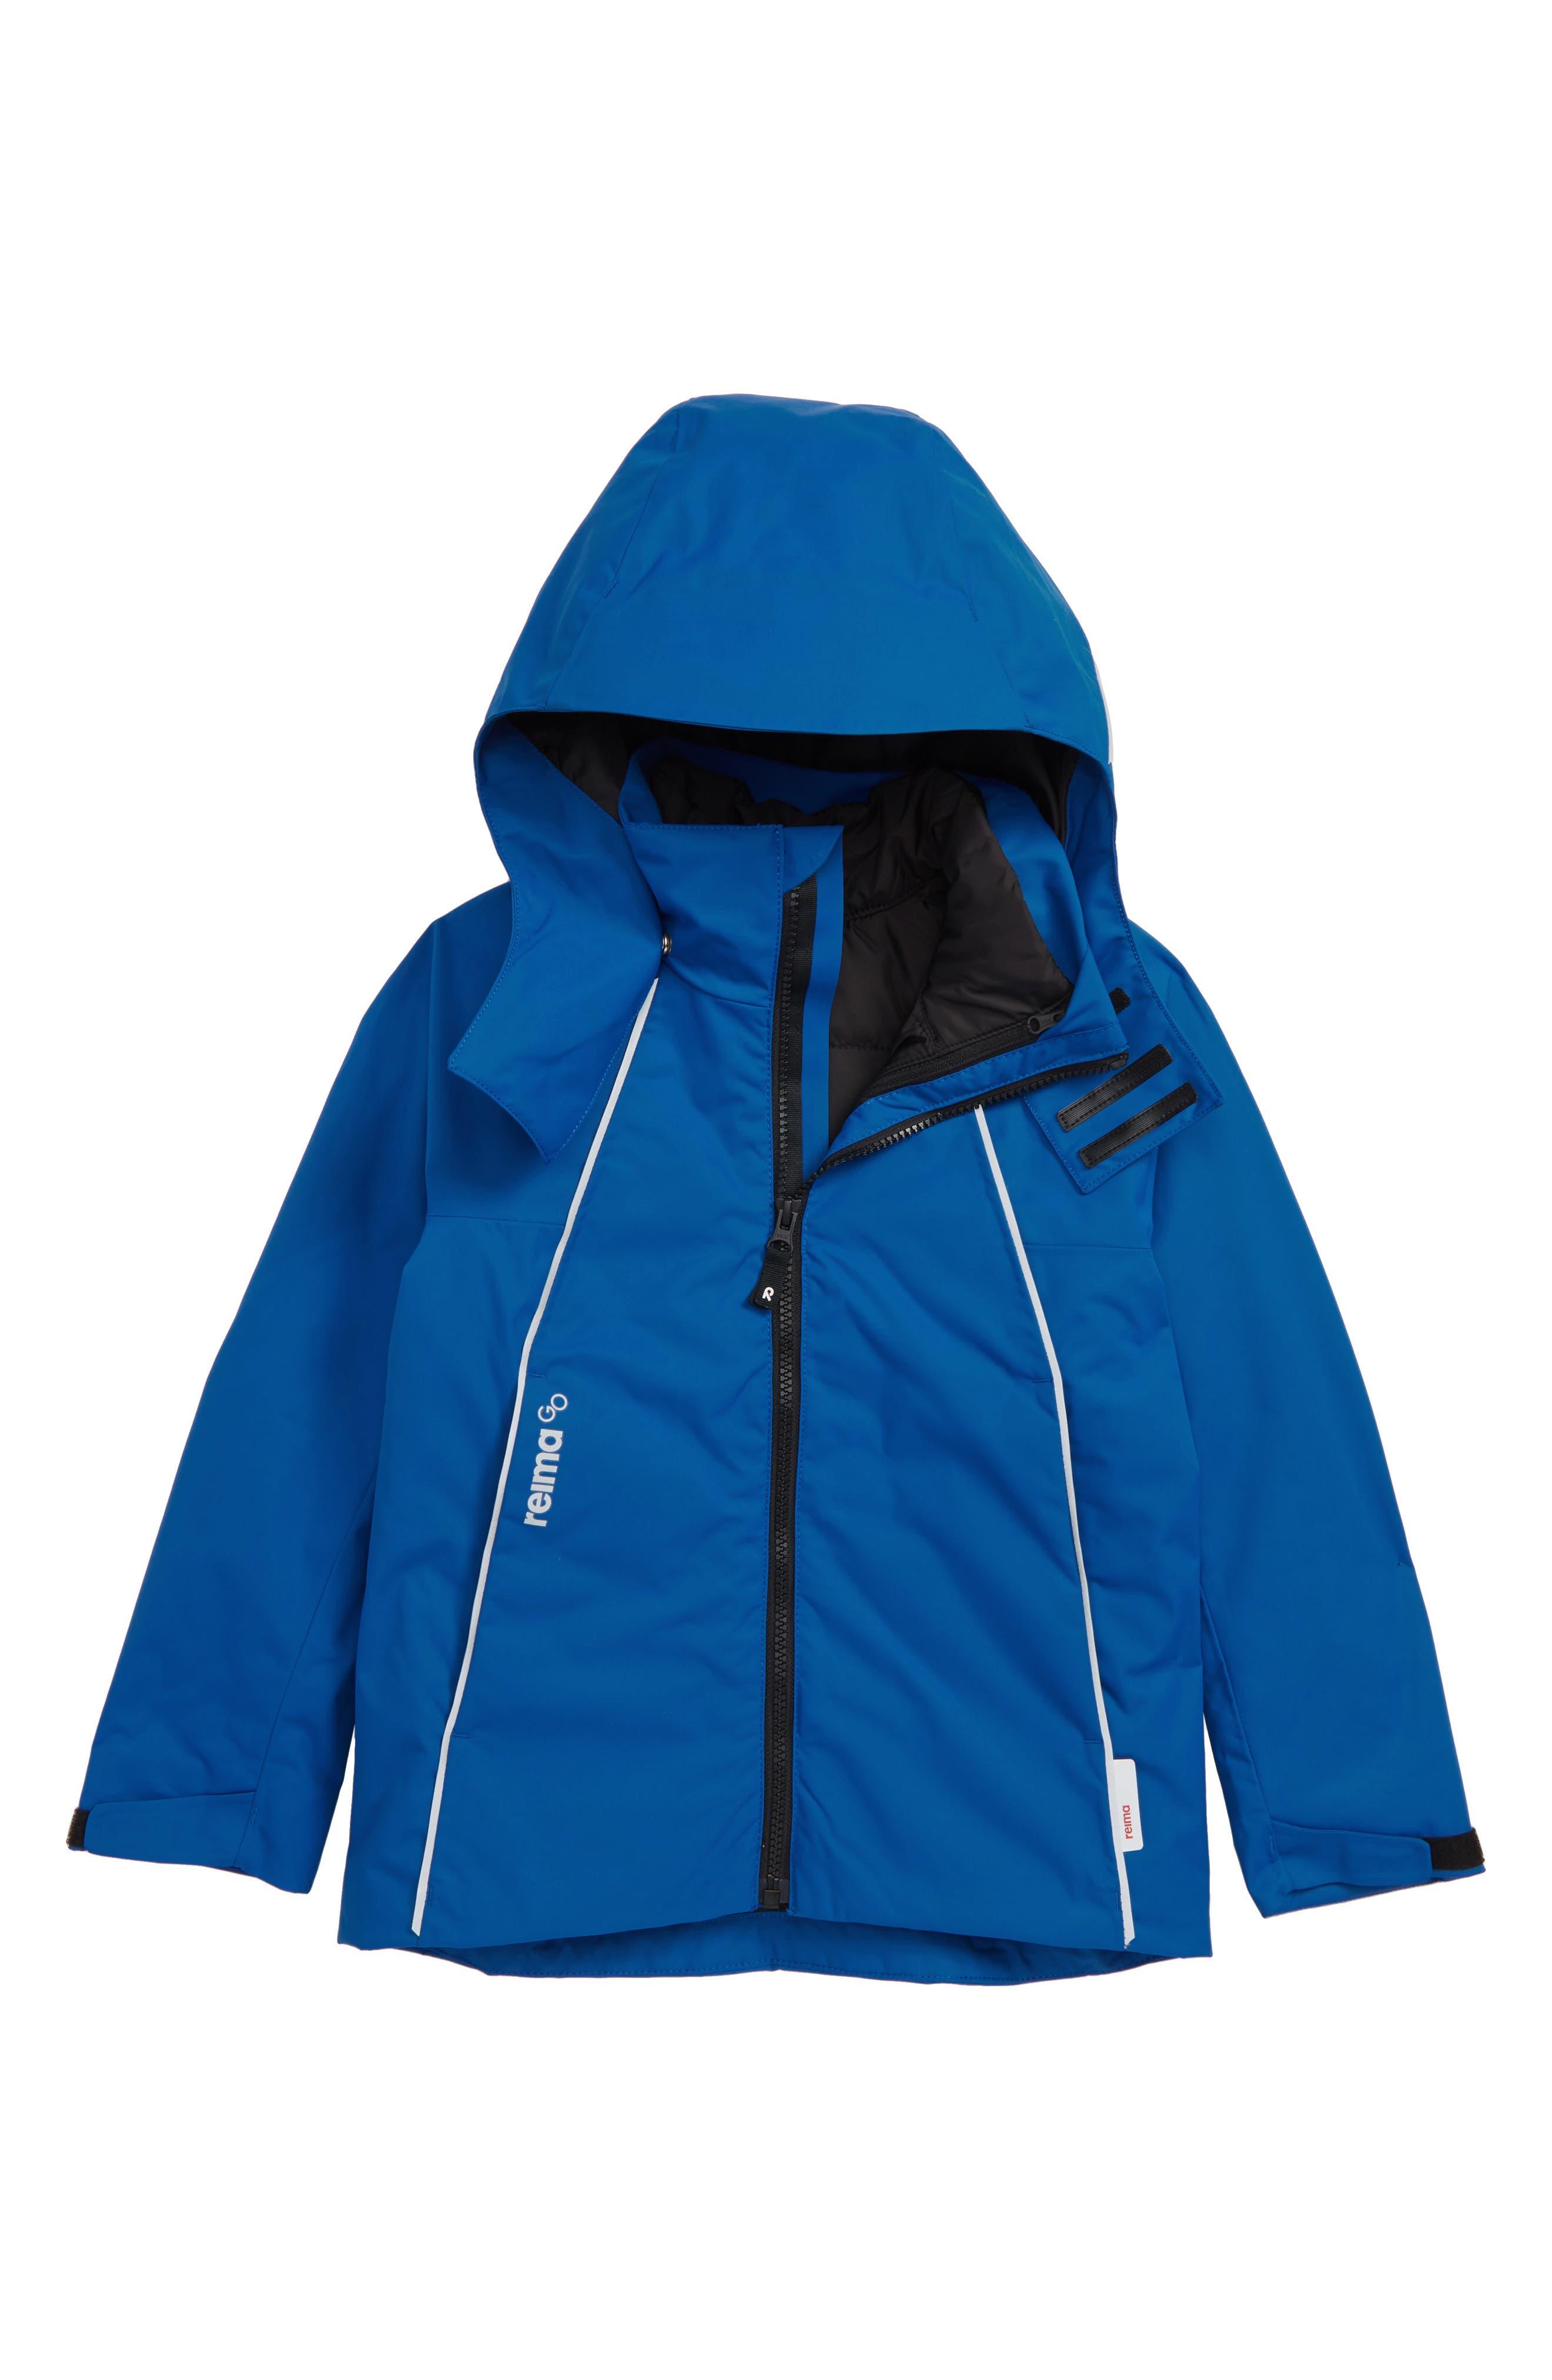 Brisk Reimatec<sup>®</sup> 3-in-1 Windproof & Waterproof Jacket,                         Main,                         color, BLUE